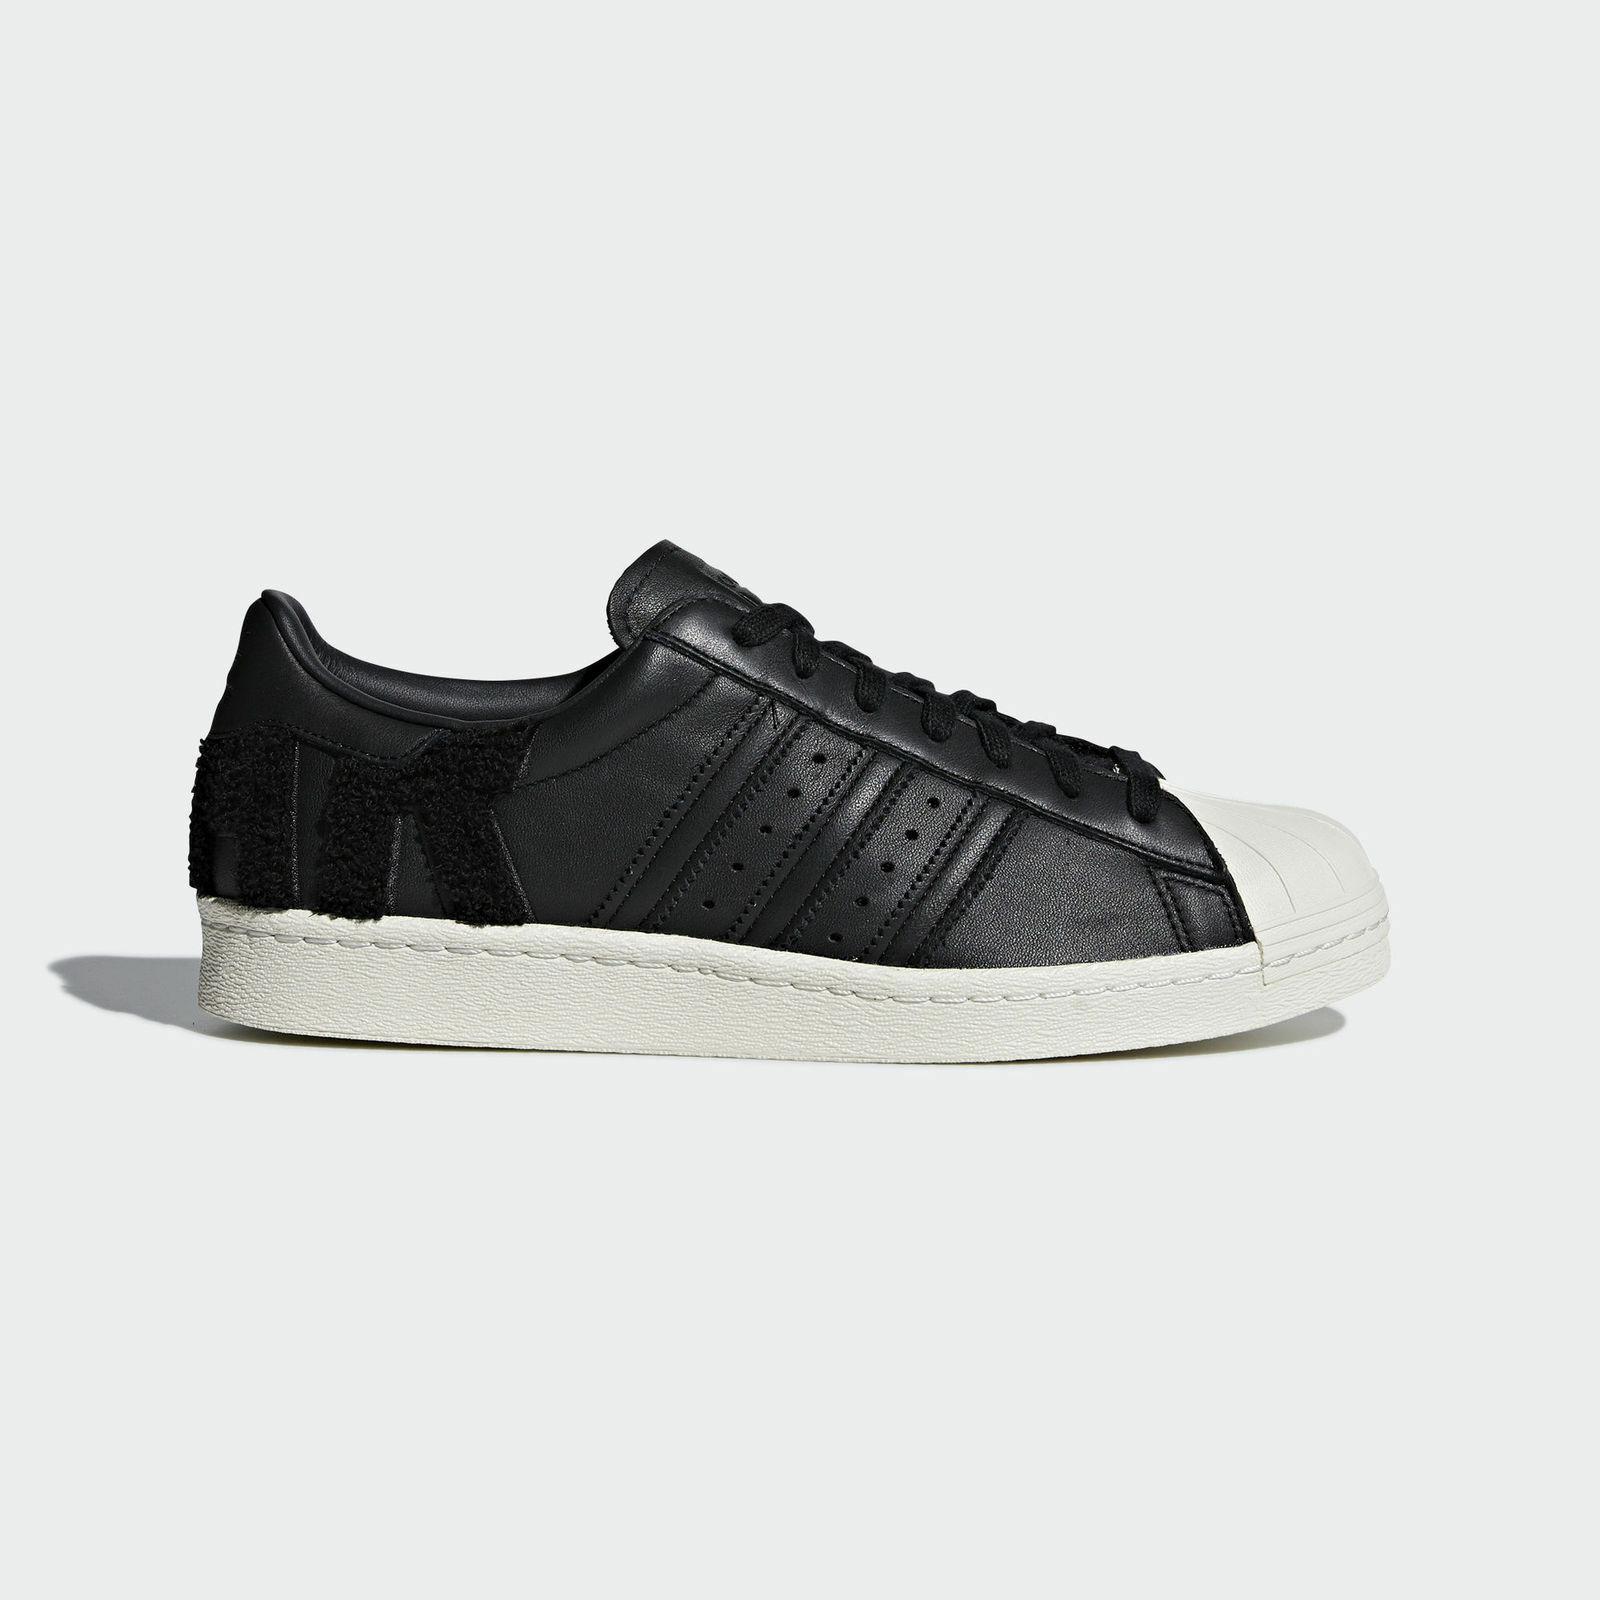 Adidas Originals Mens Superstar SST 80s schuhe - Größe 12 UK   BNWT